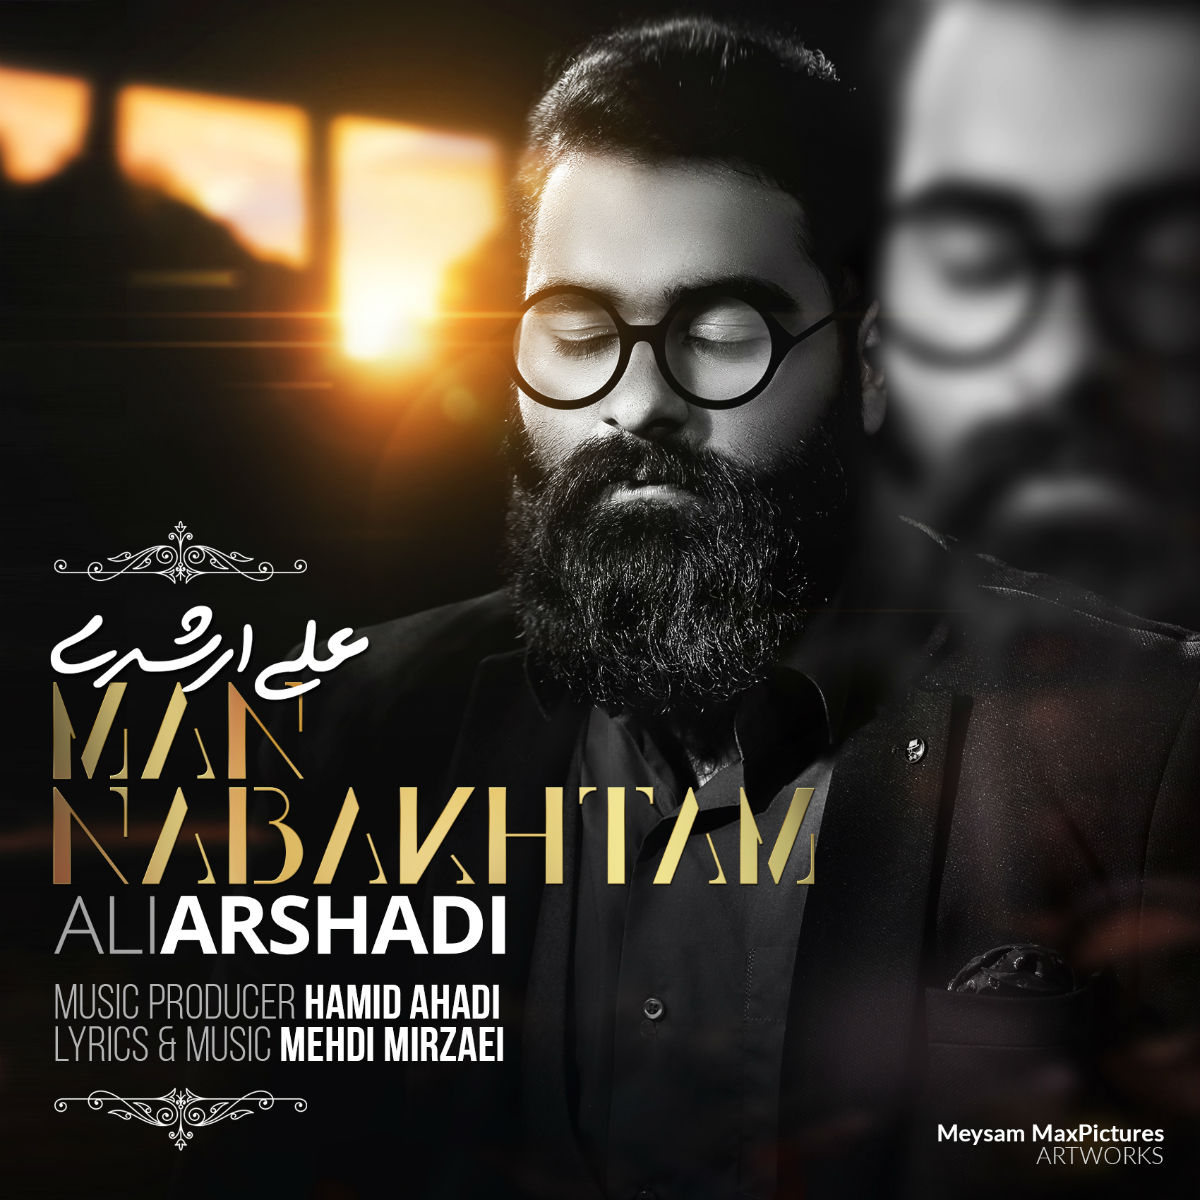 Ali Arshadi - Man Nabakhtam Music   آهنگ علی ارشدی - من نباختم